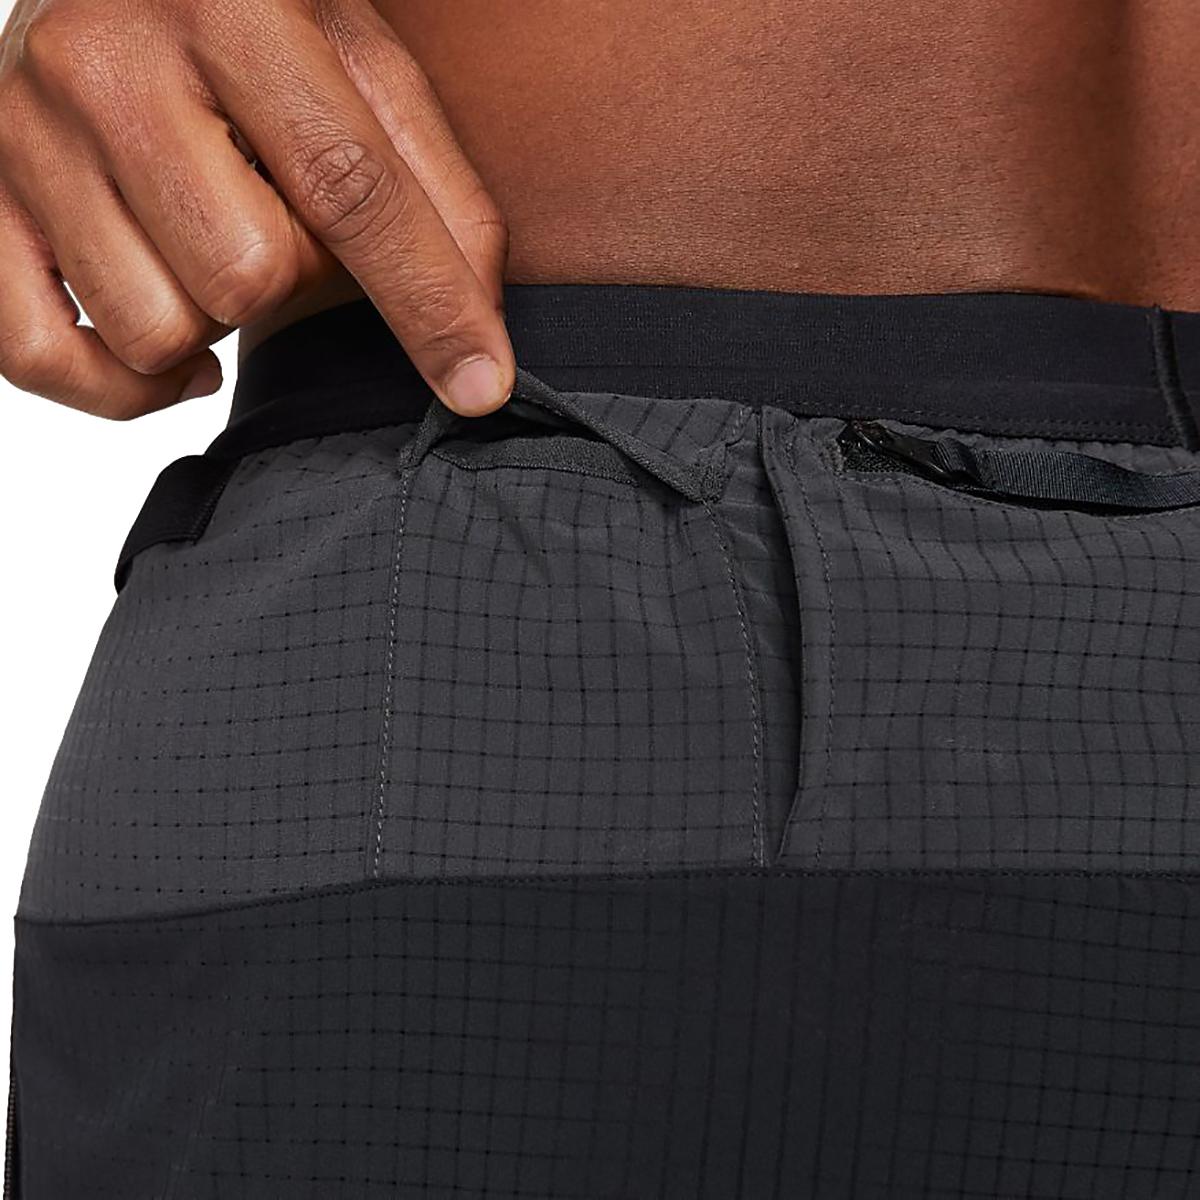 Men's Nike Dri-FIT Flex Stride Trail Shorts, , large, image 6